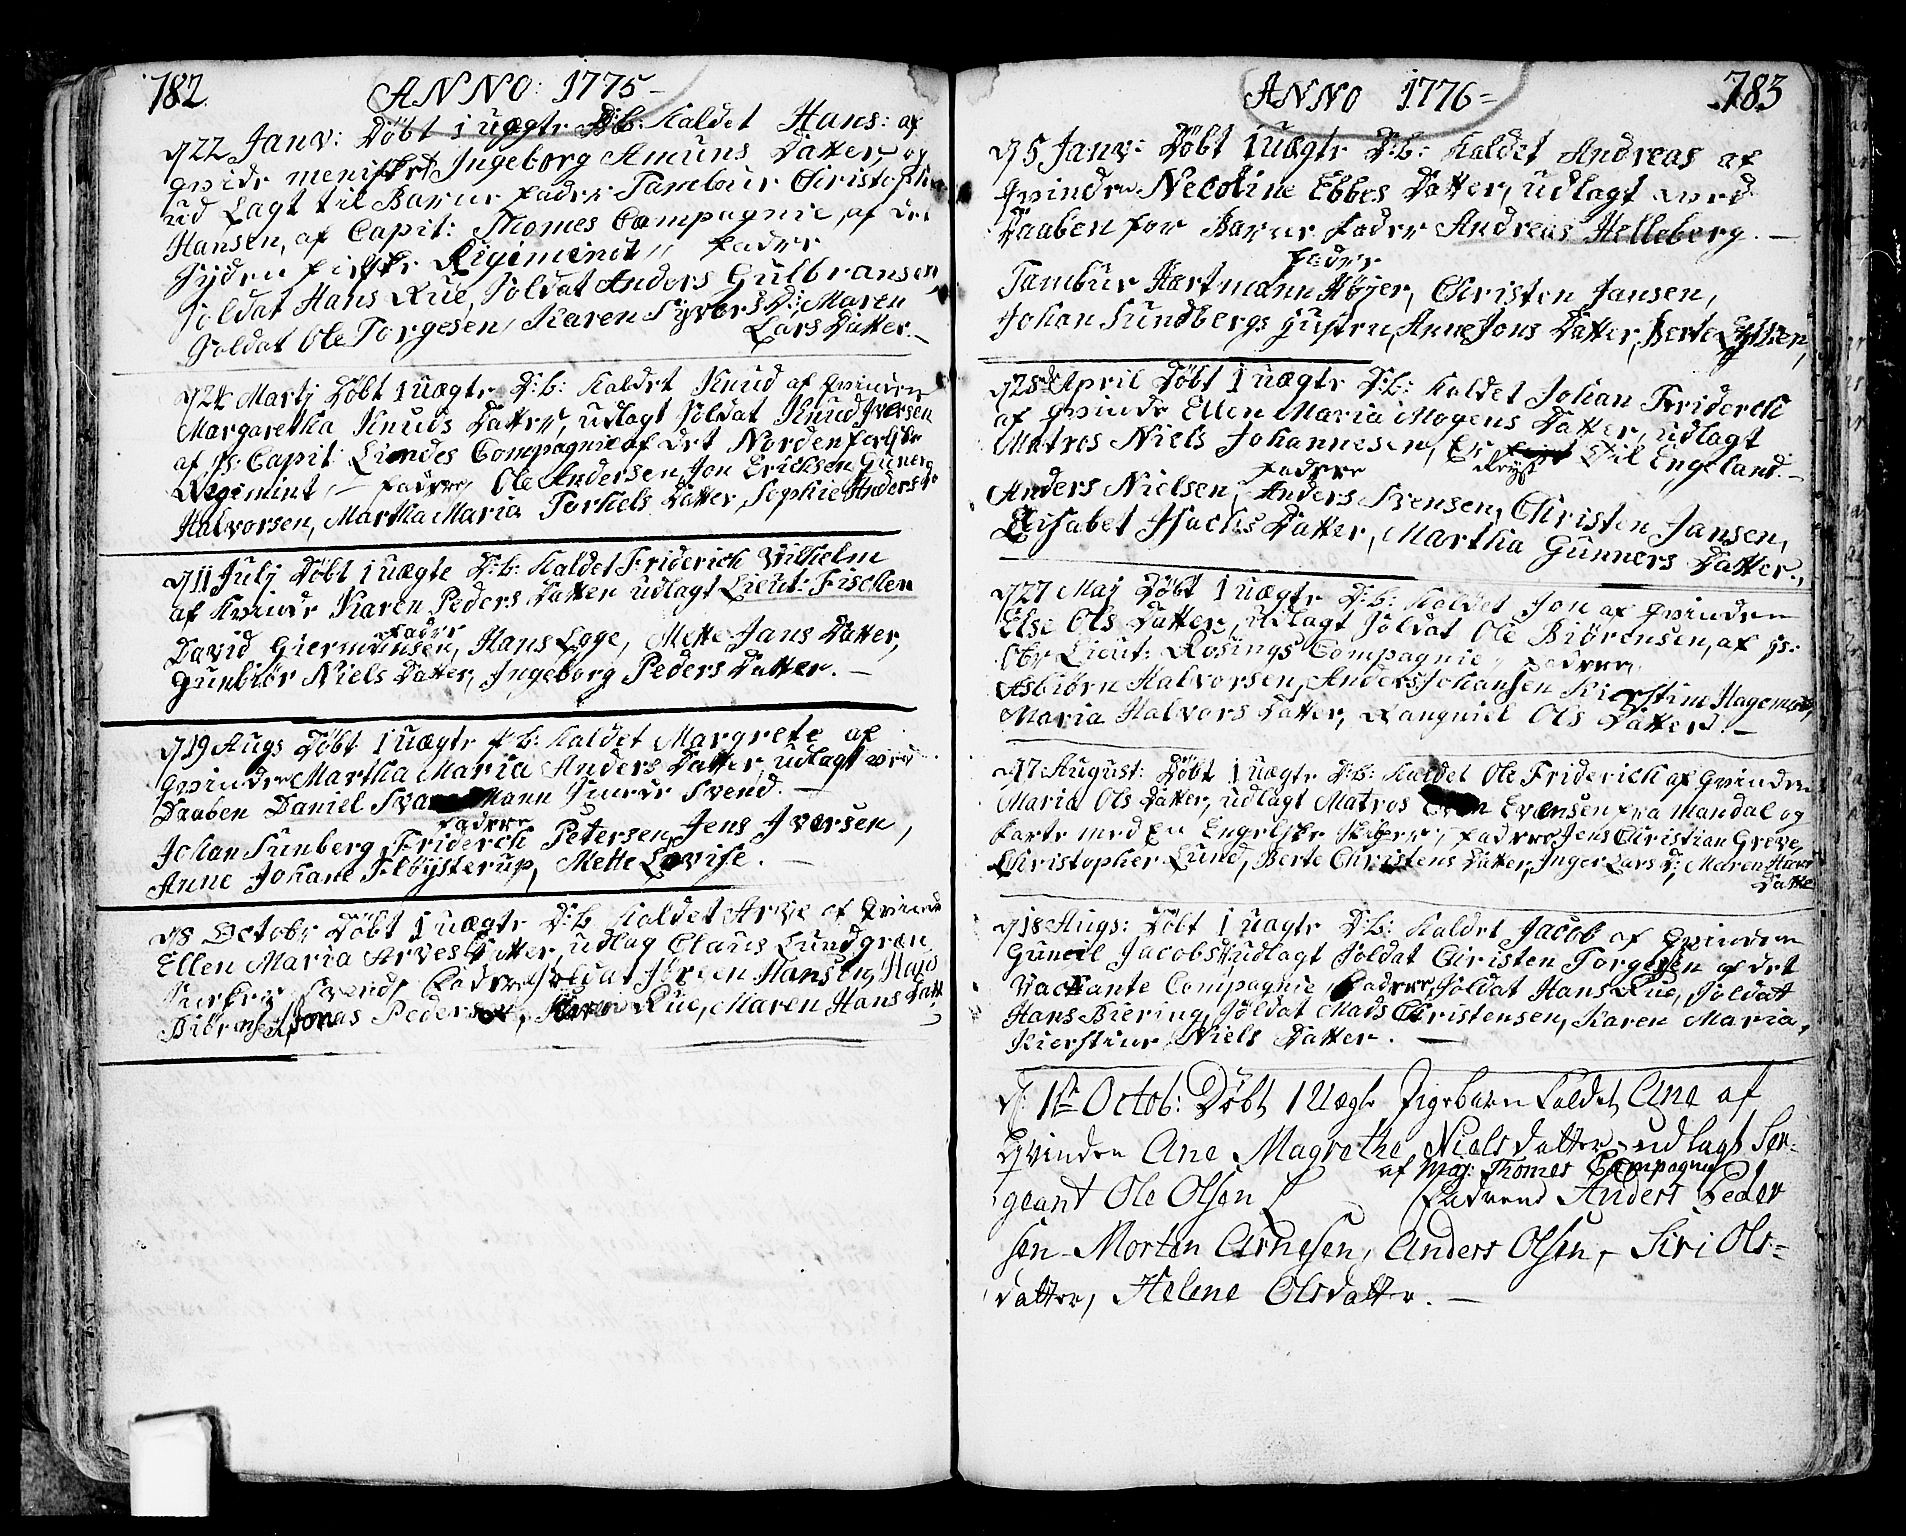 SAO, Fredrikstad prestekontor Kirkebøker, F/Fa/L0002: Ministerialbok nr. 2, 1750-1804, s. 782-783